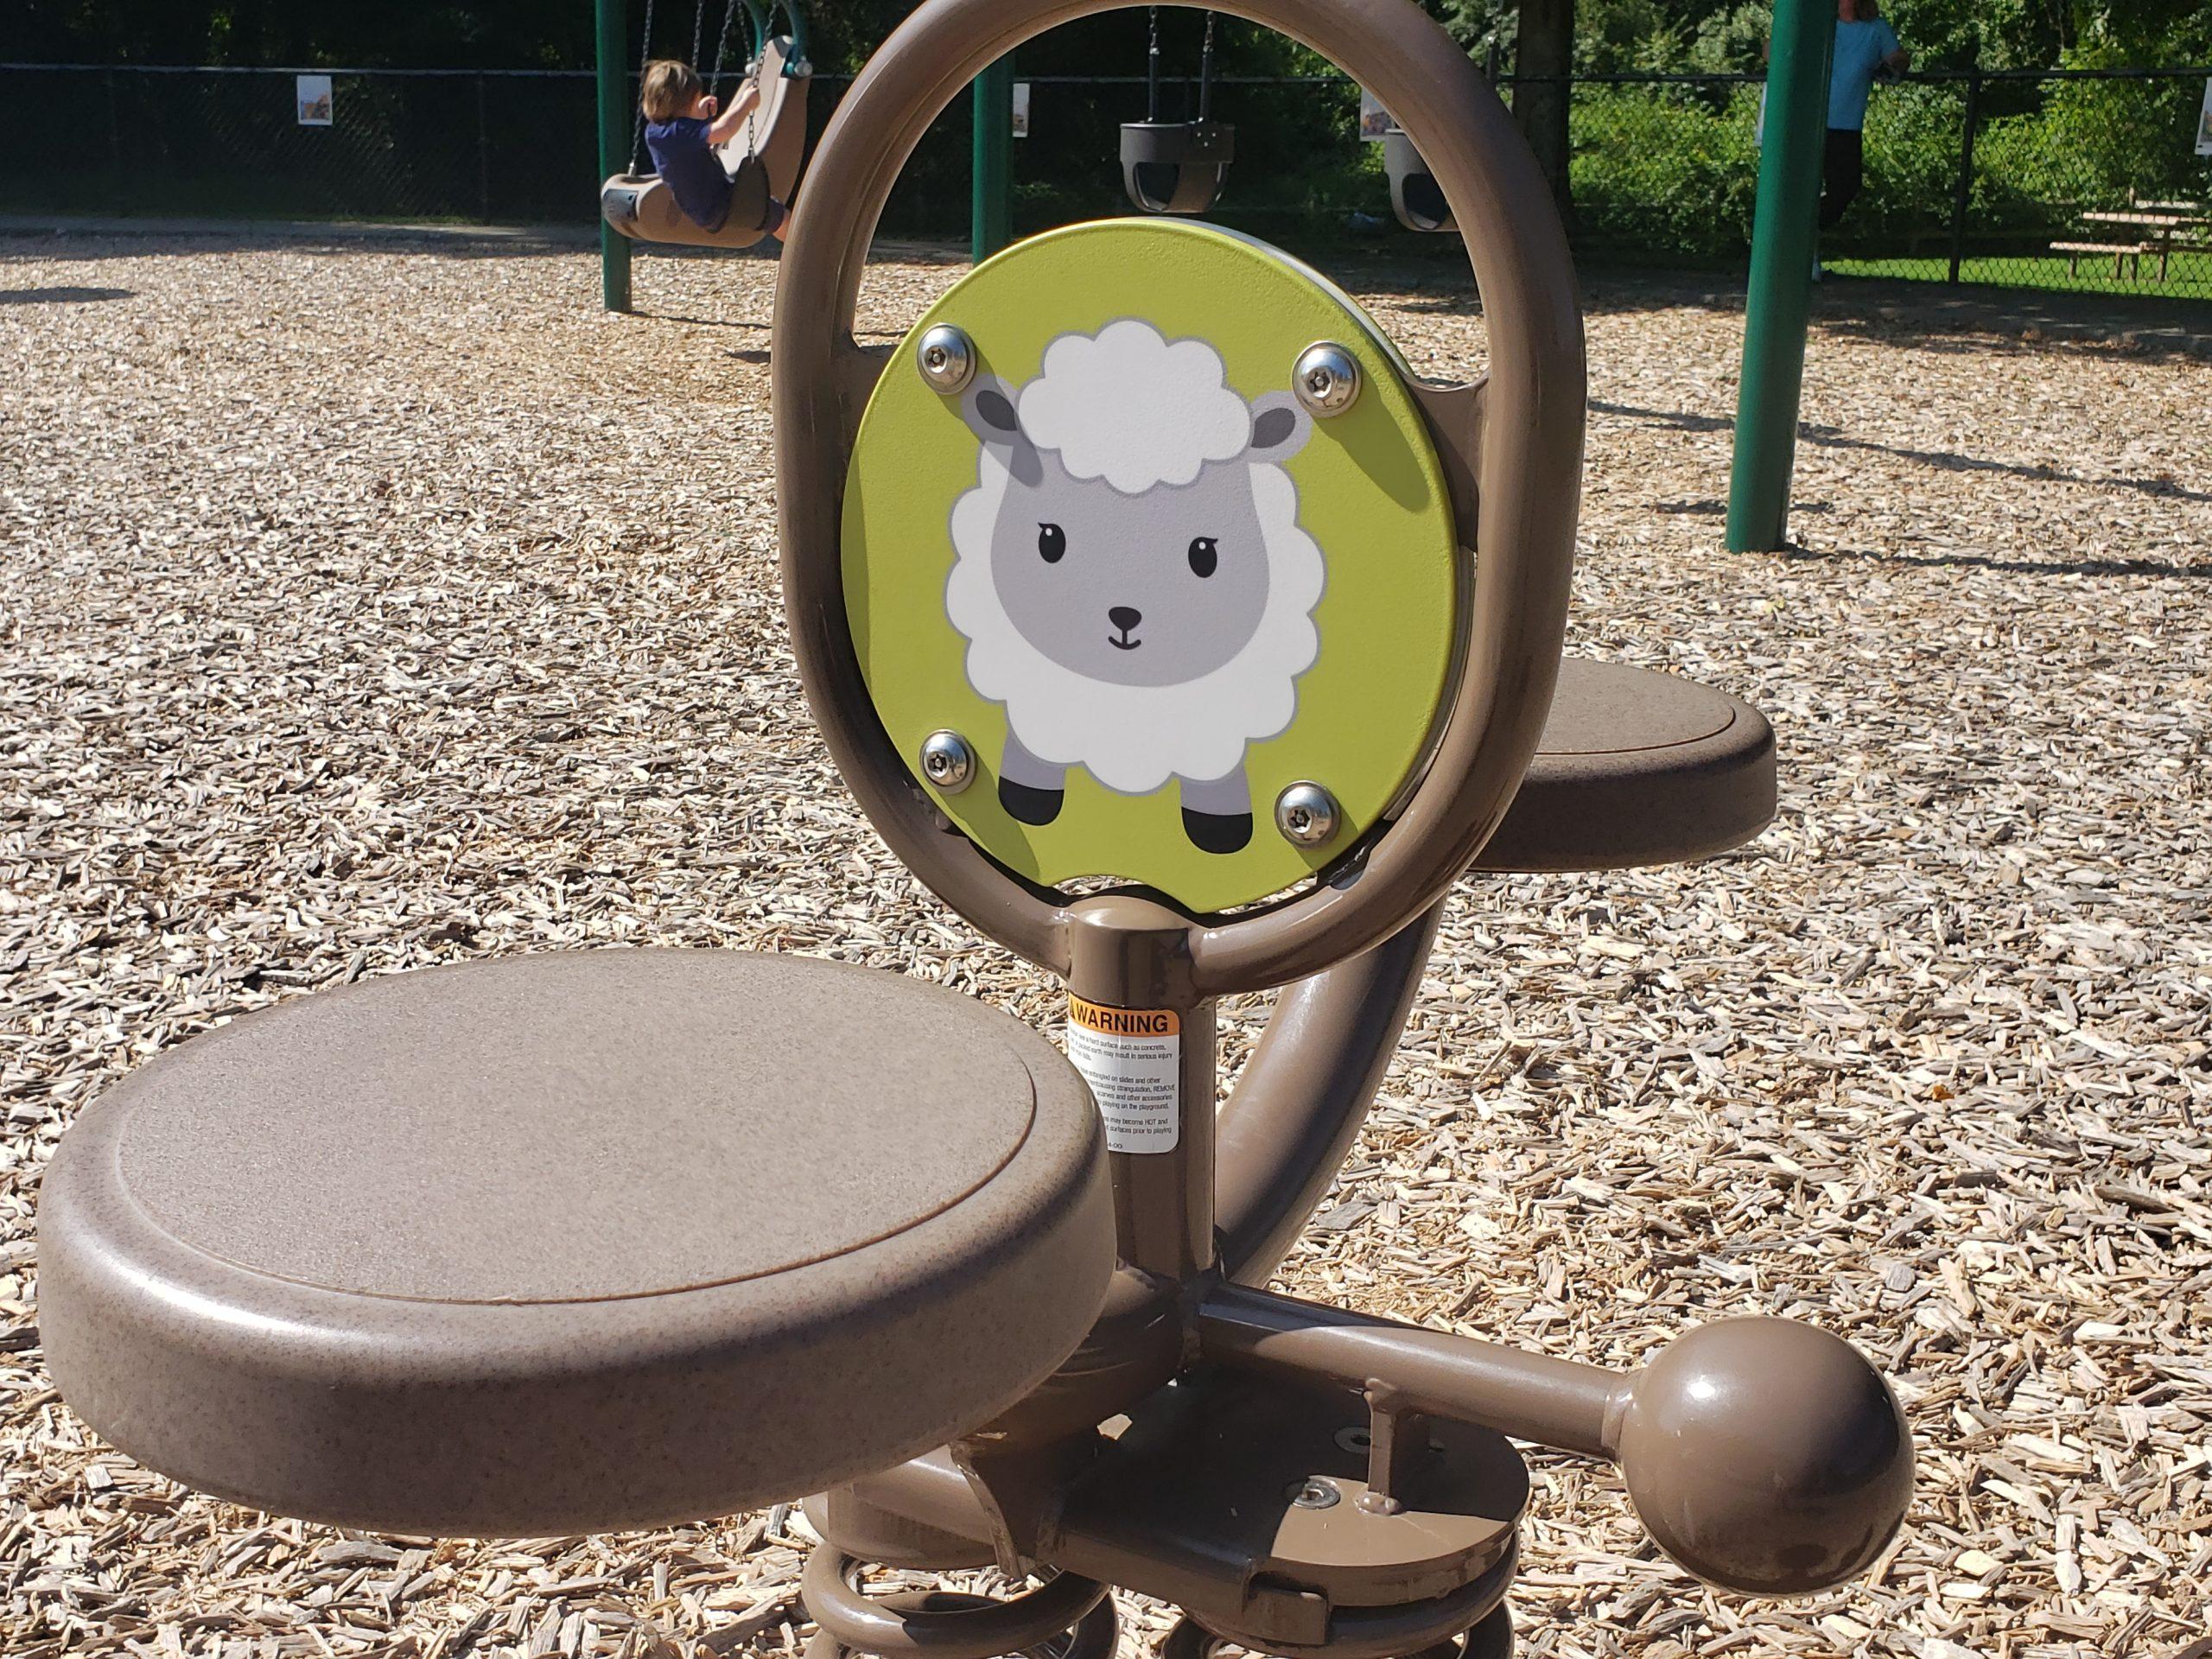 Custom Digifuse Double Bobble Rider at Farm Theme Playground